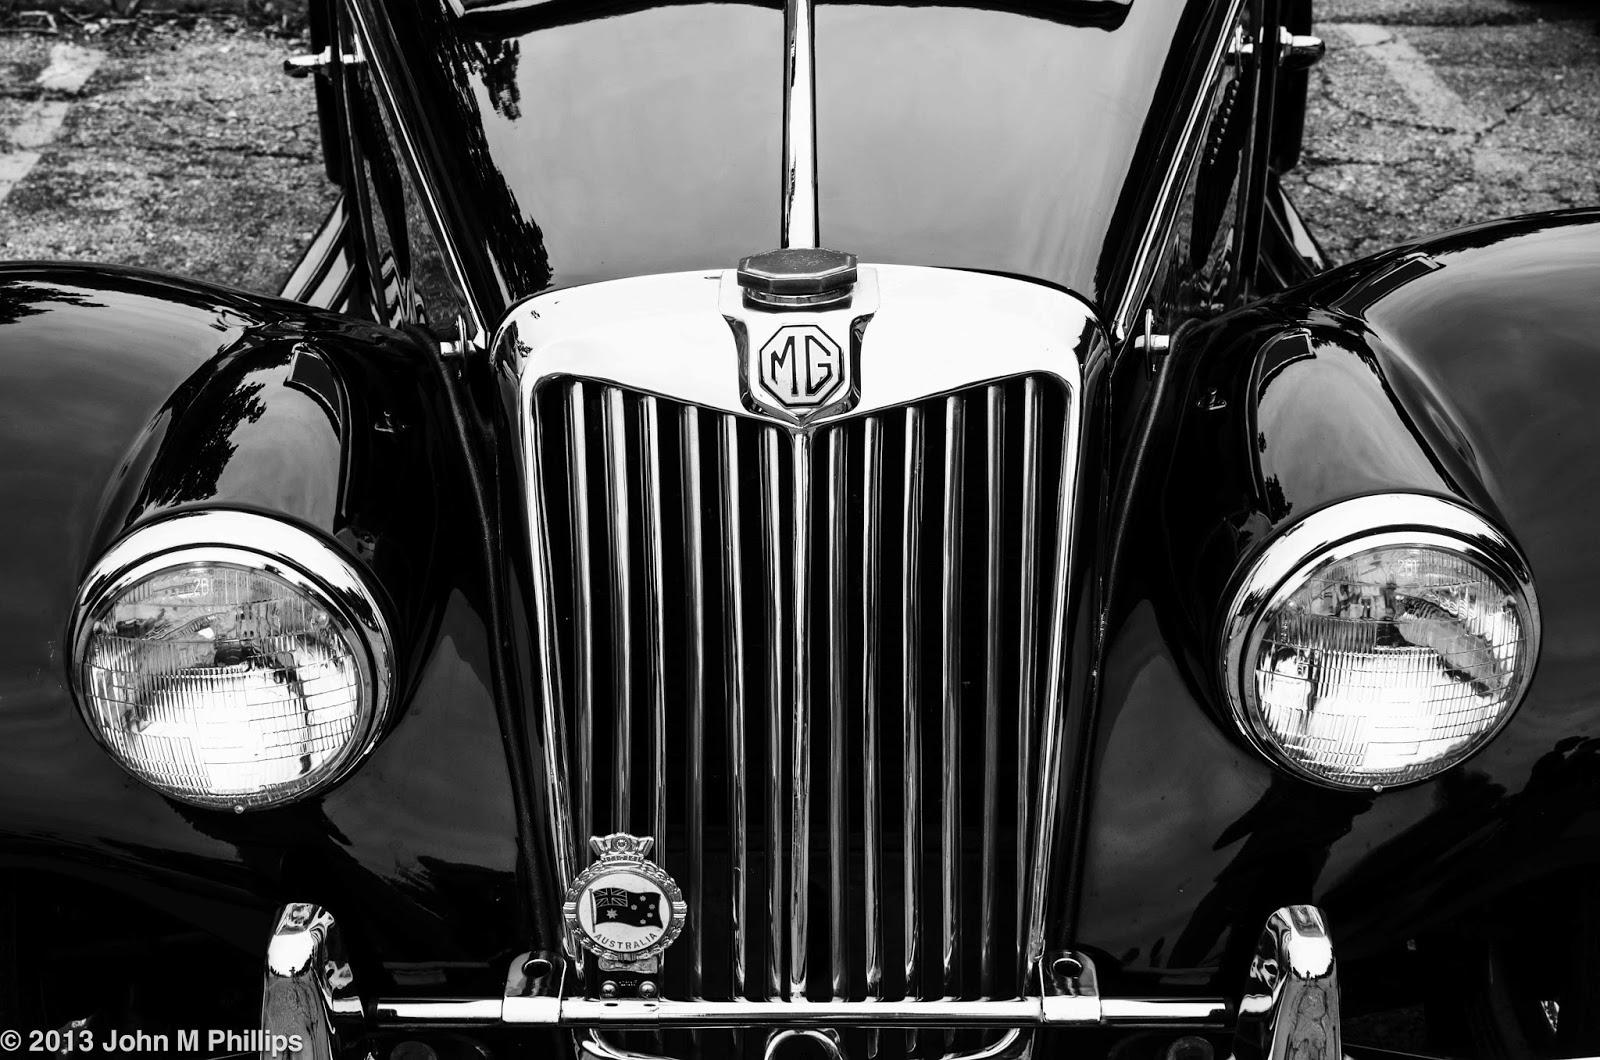 SKEPTIC PHOTO CLASSIC CARS IN BLACK WHITE